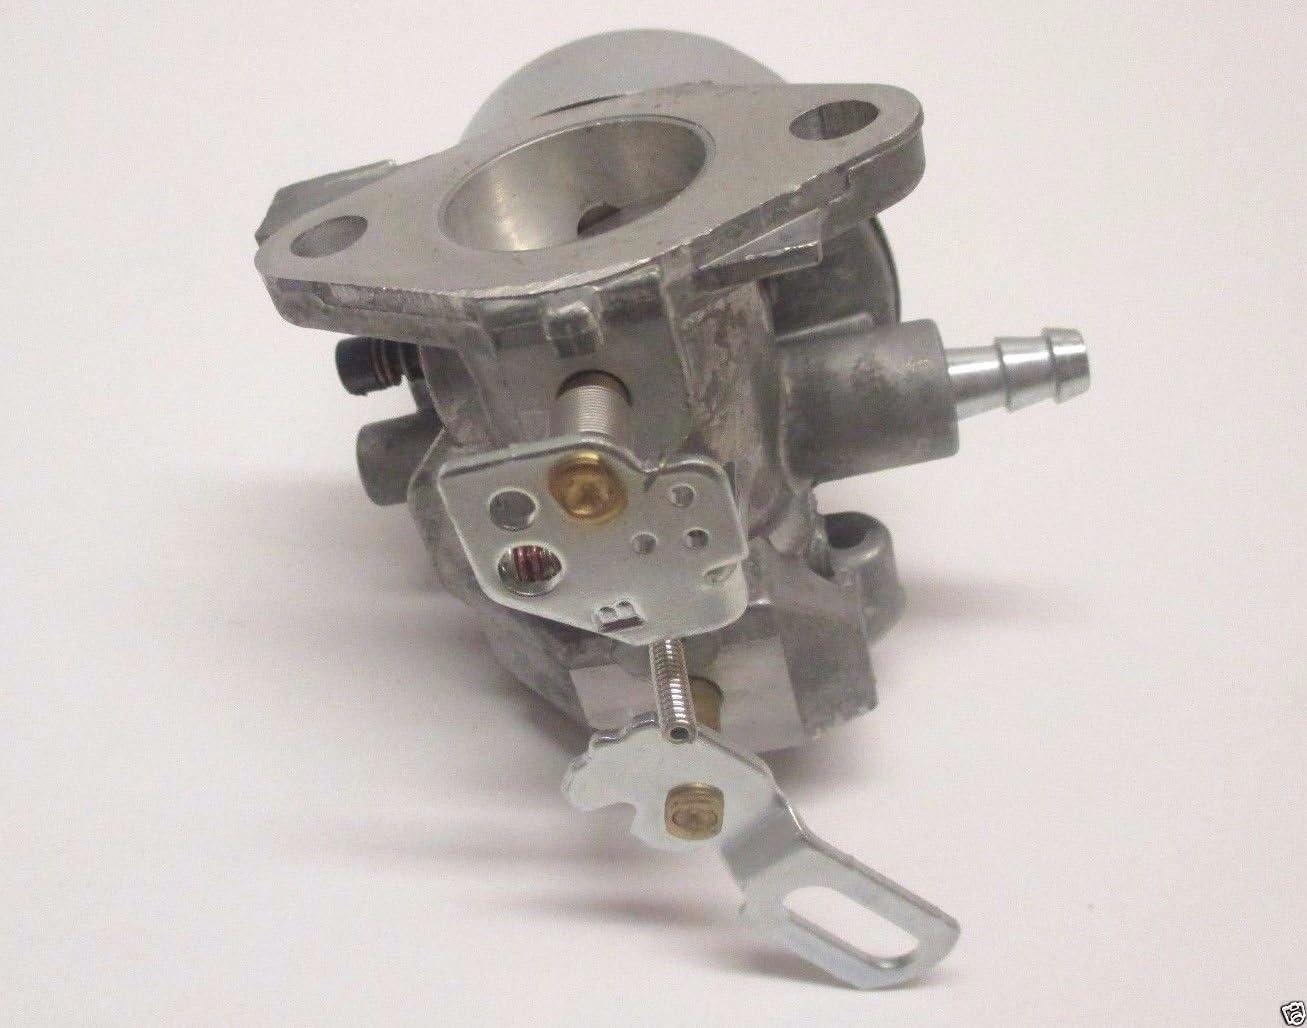 Vergaser Carb für 632370A 632370 632110 Fit HM100 HMSK100 HMSK90 NEU